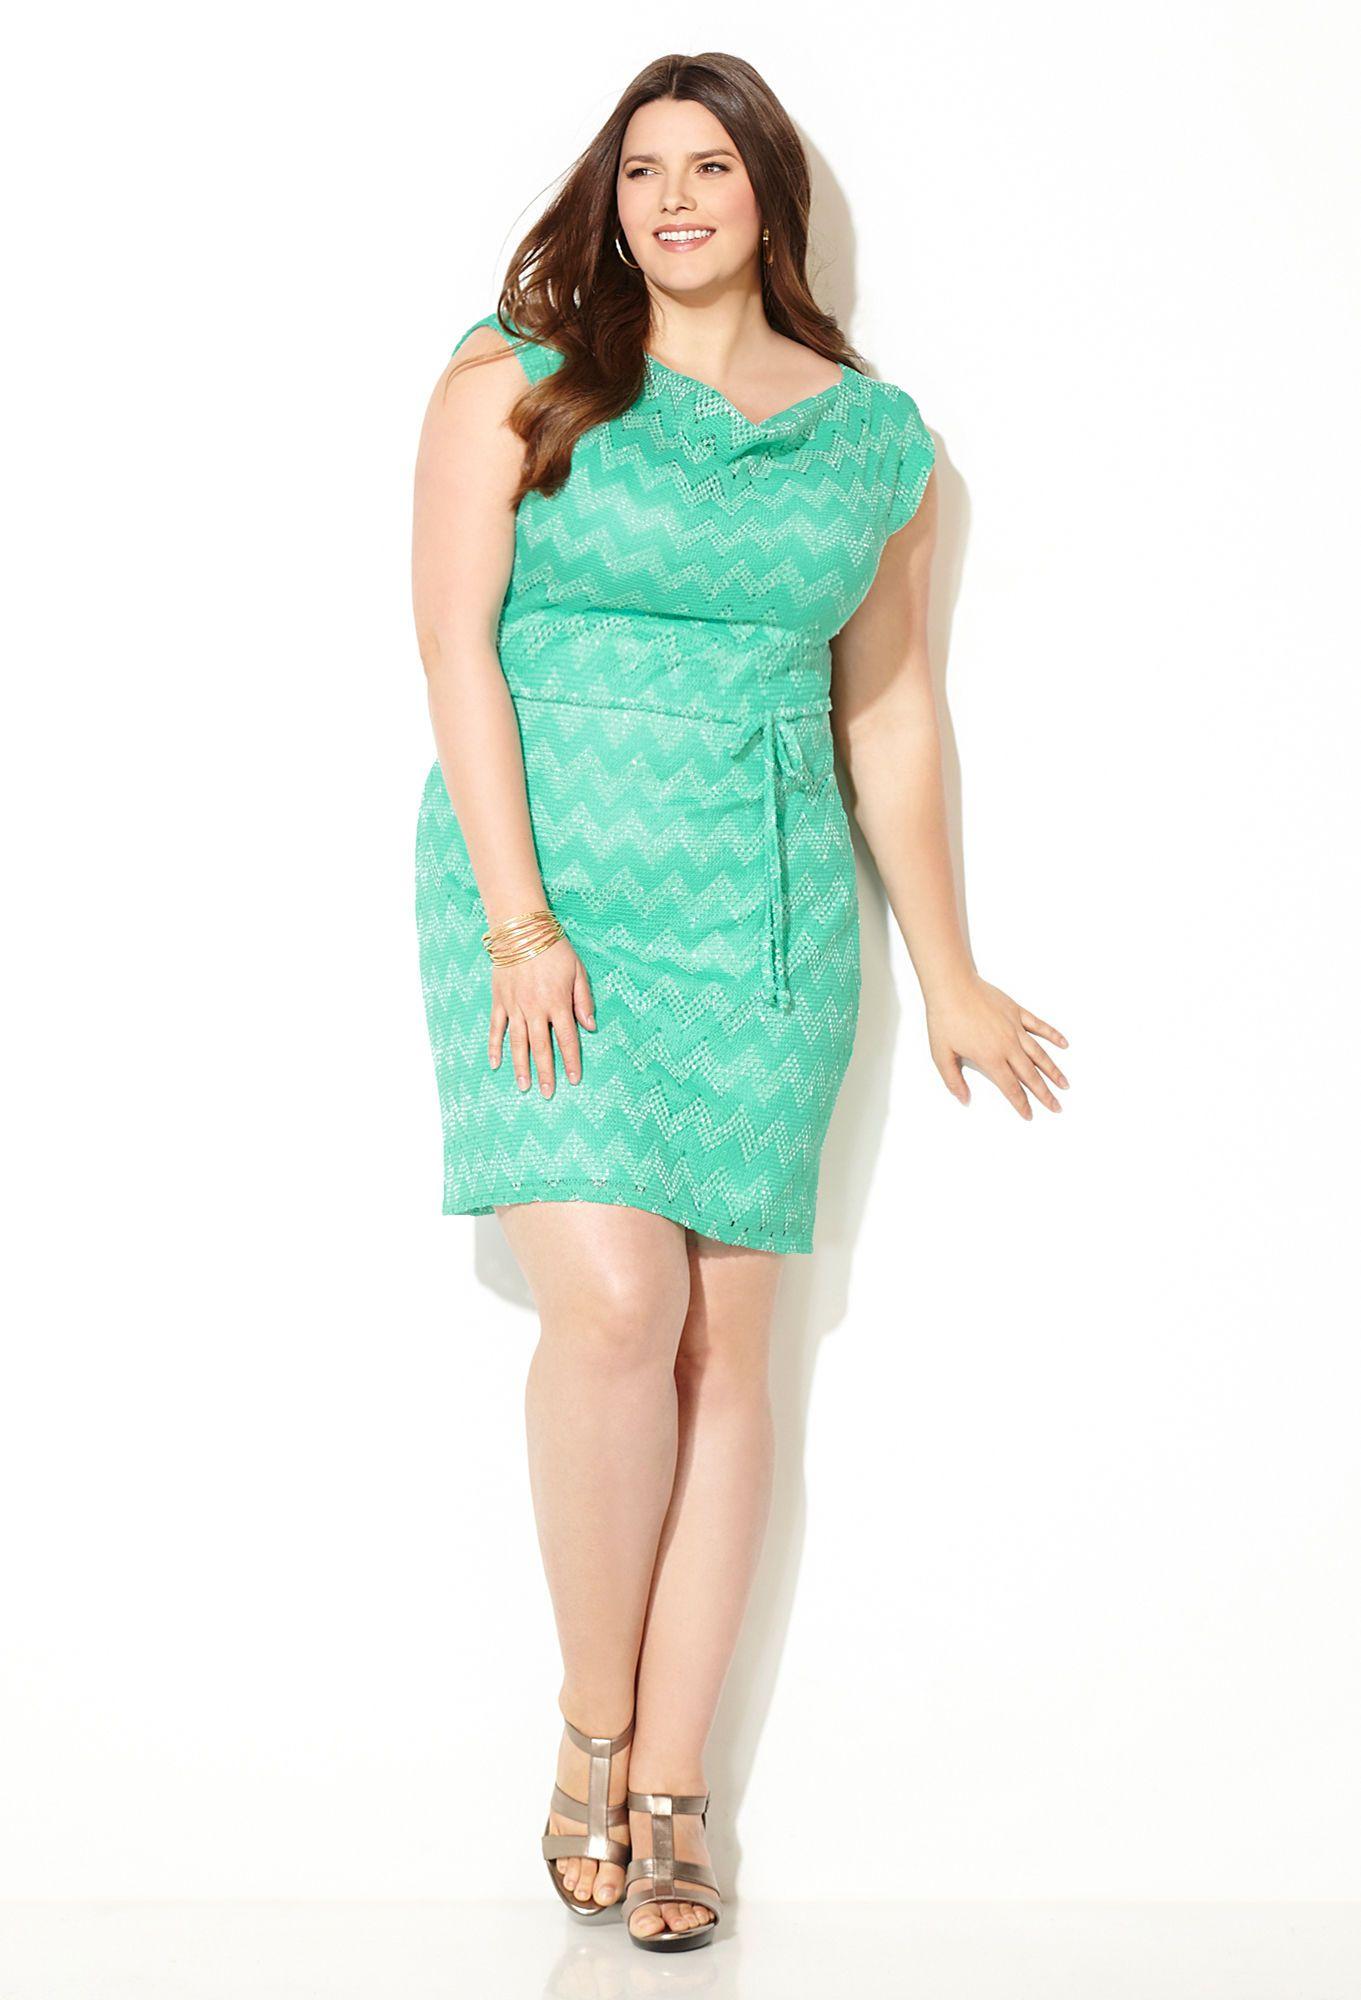 Mint Chevron Crochet Dress-Plus Size Dress-Avenue | Sarah Slick ...